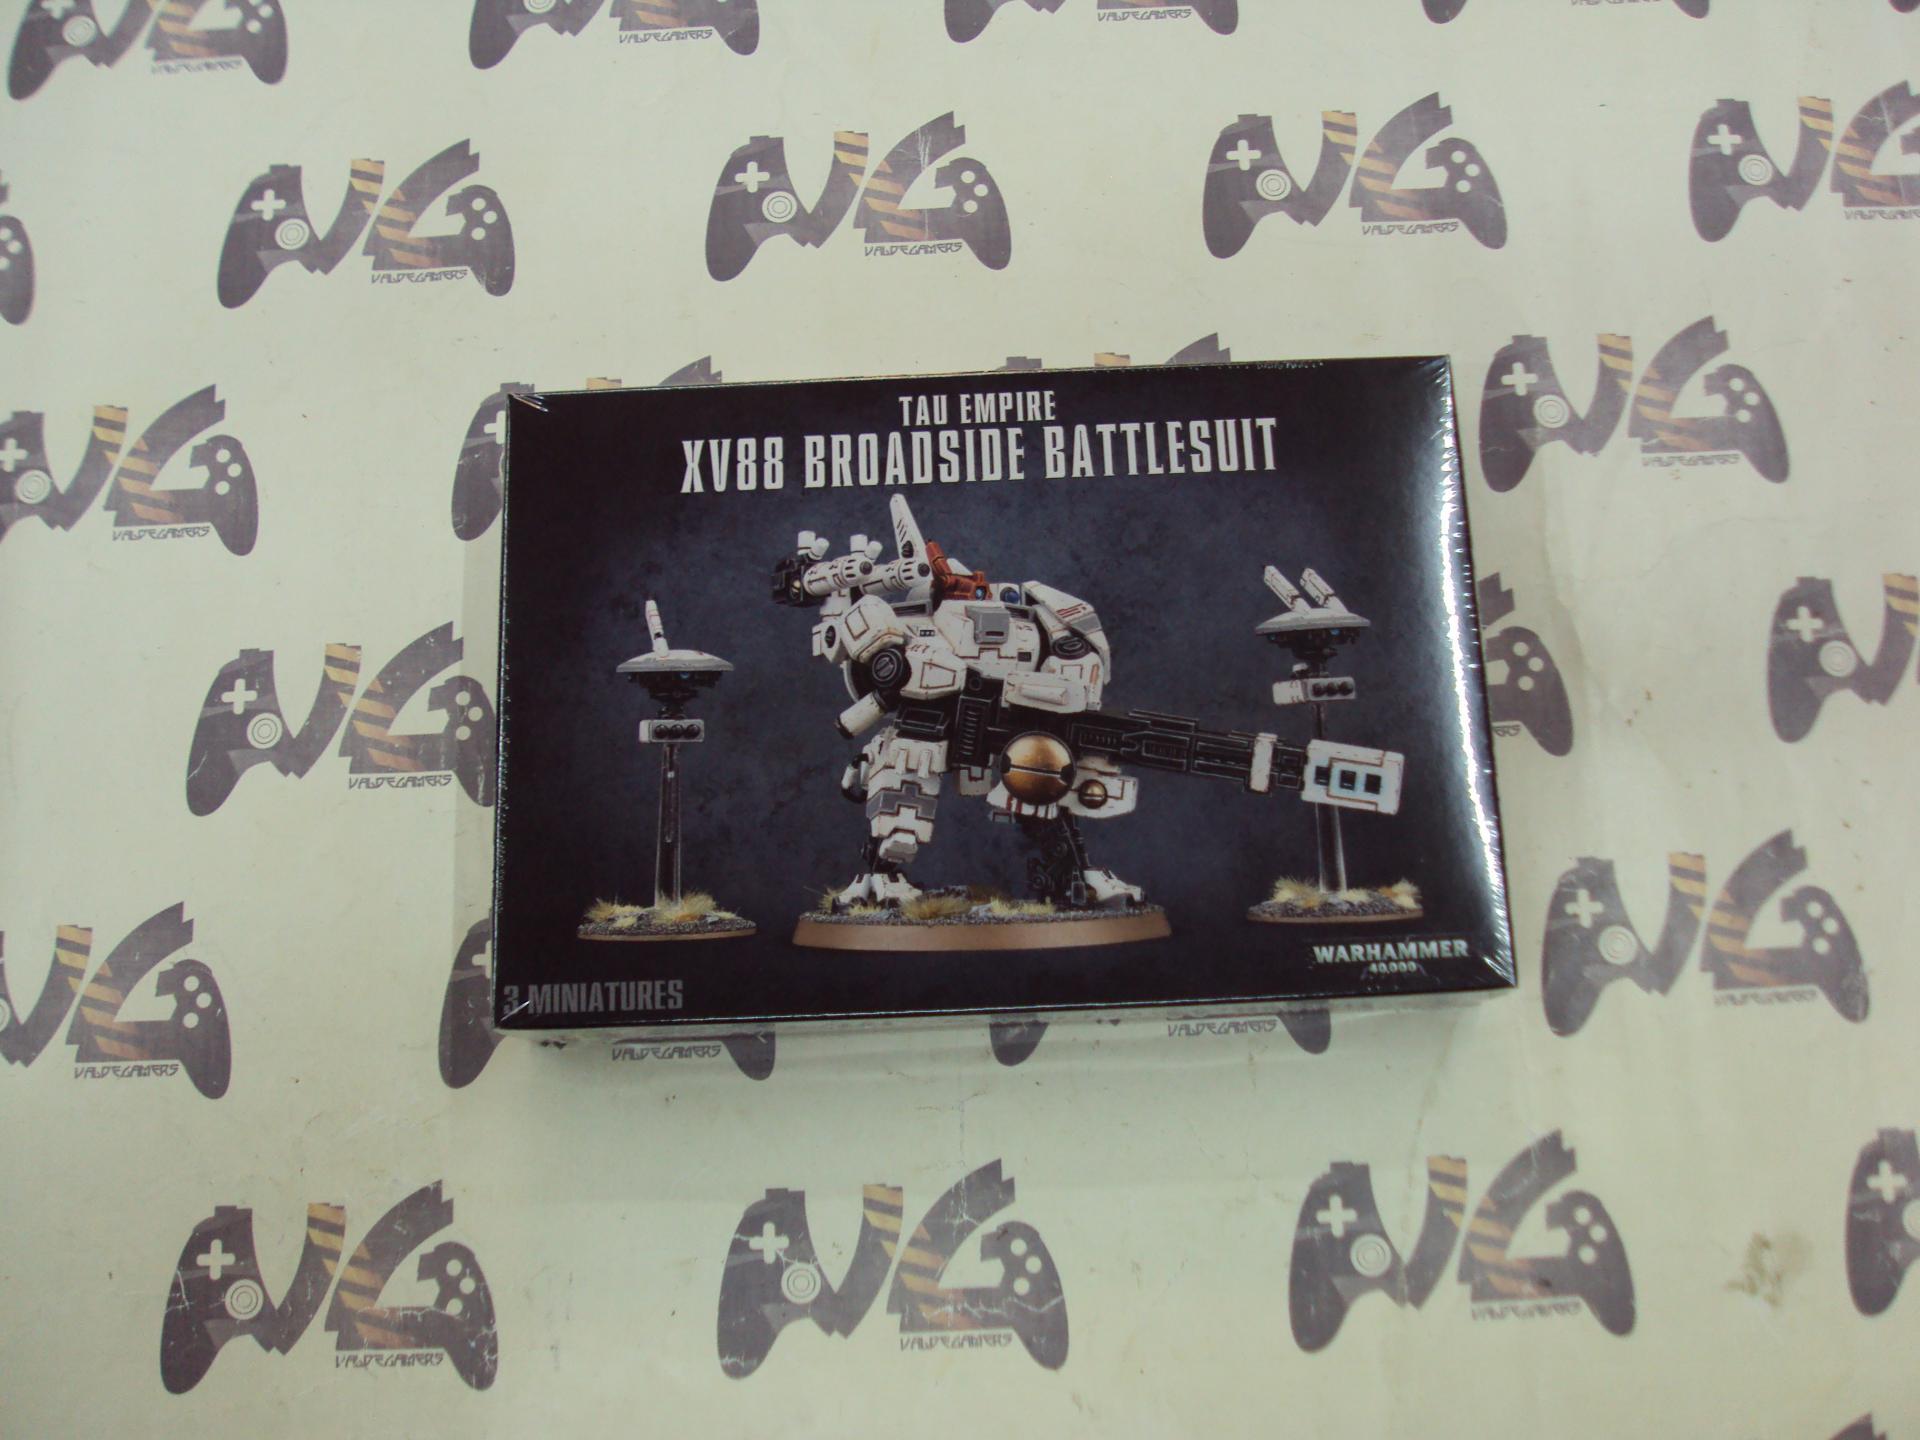 TAU EMPIRE XV88 BROADSIDE BATTLESUIT - NUEVO